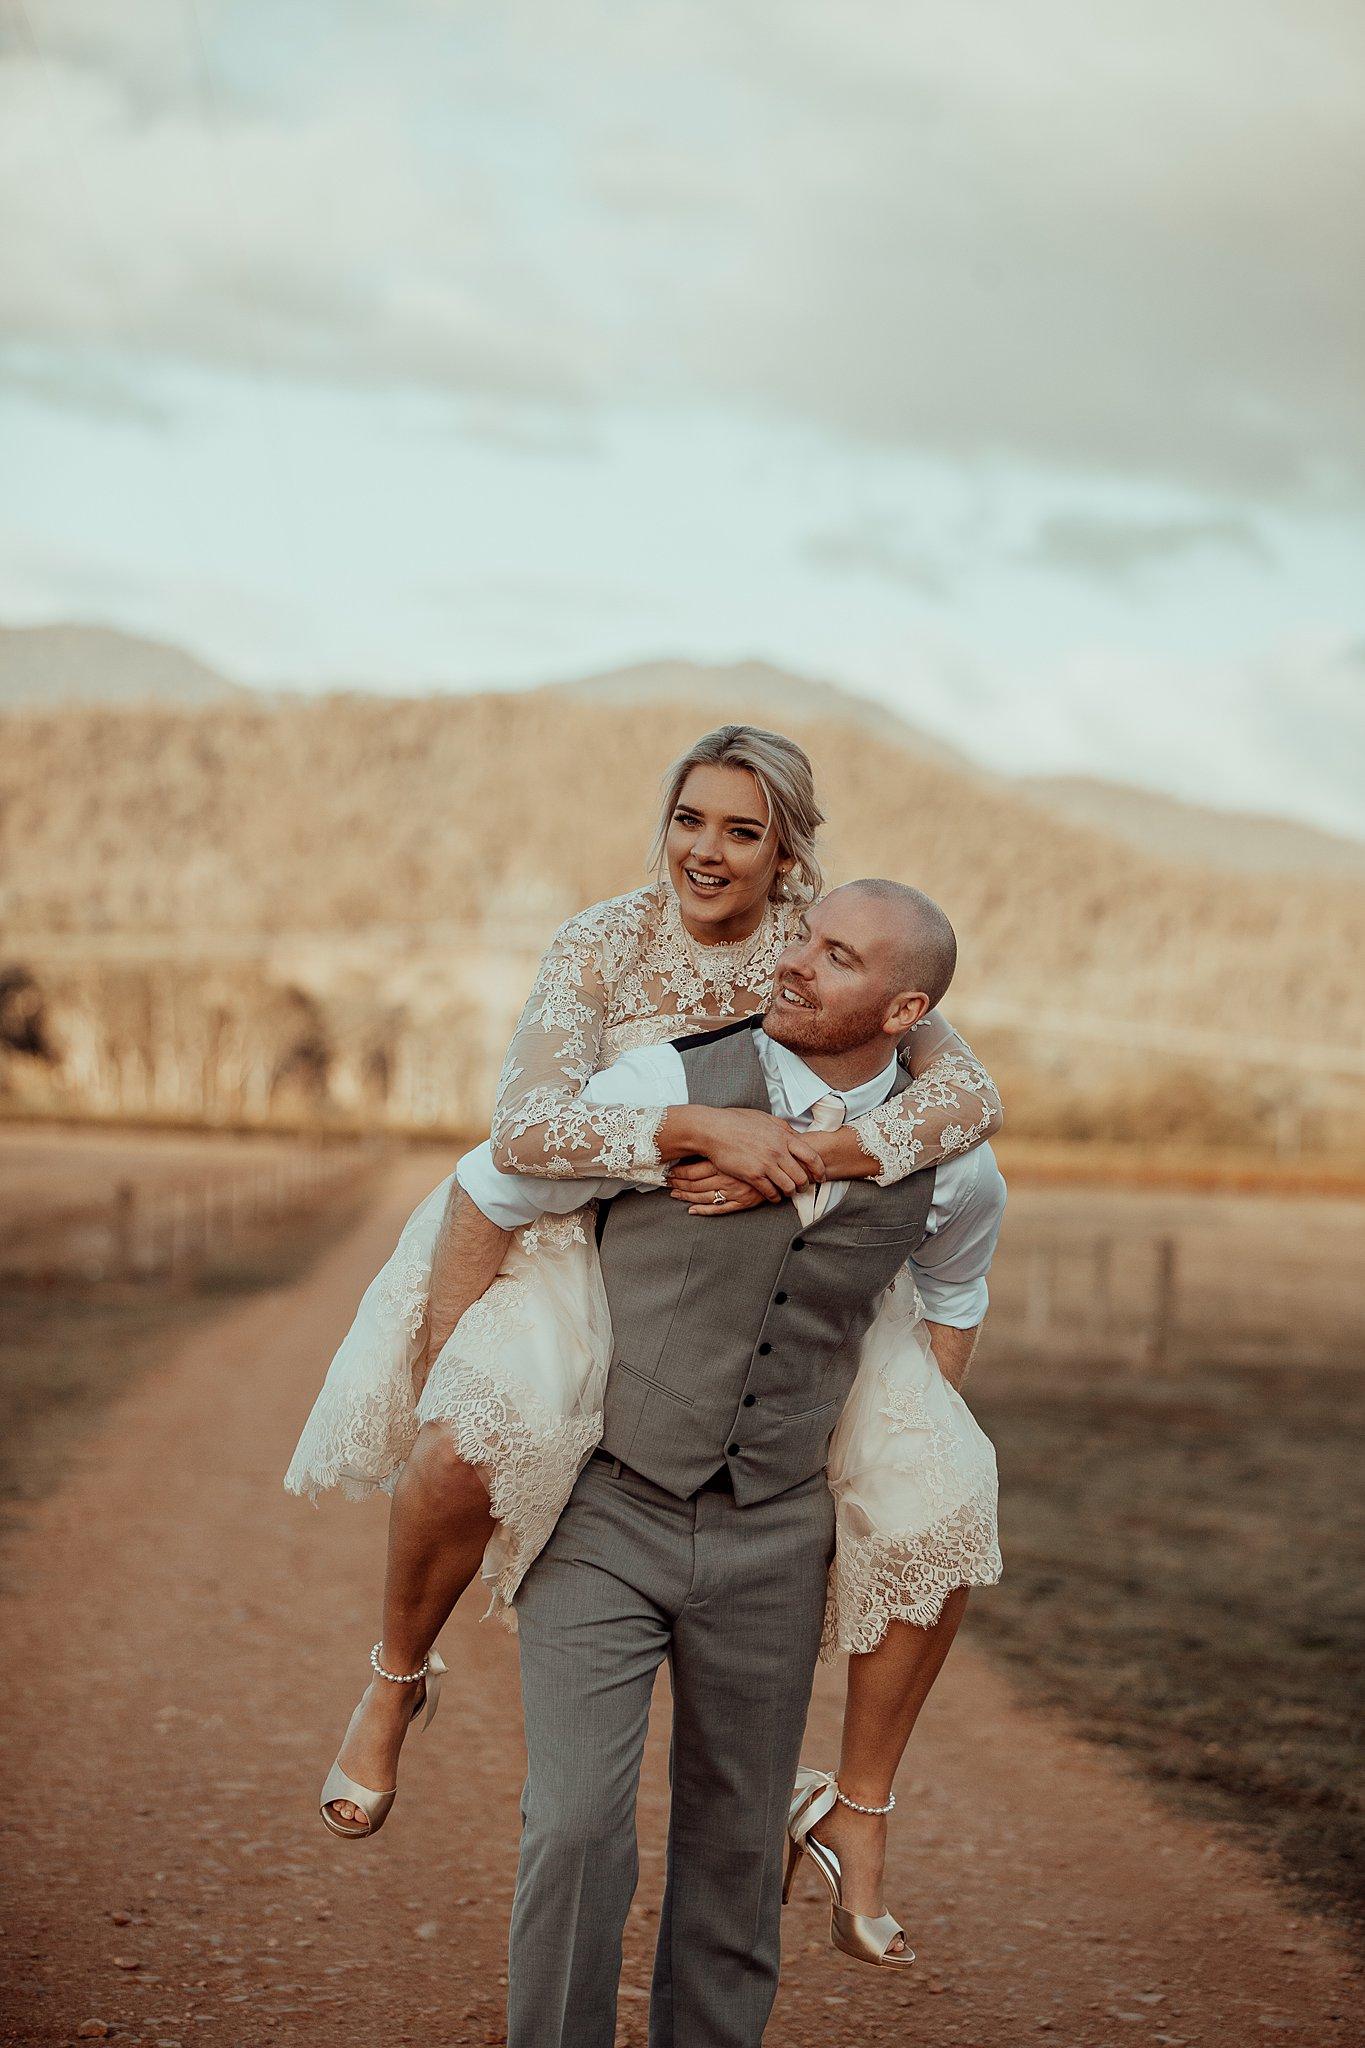 mickalathomas_puremacphotography_weddingphotographer_couplephotographer_Sheppartonphotographer_3473.jpg